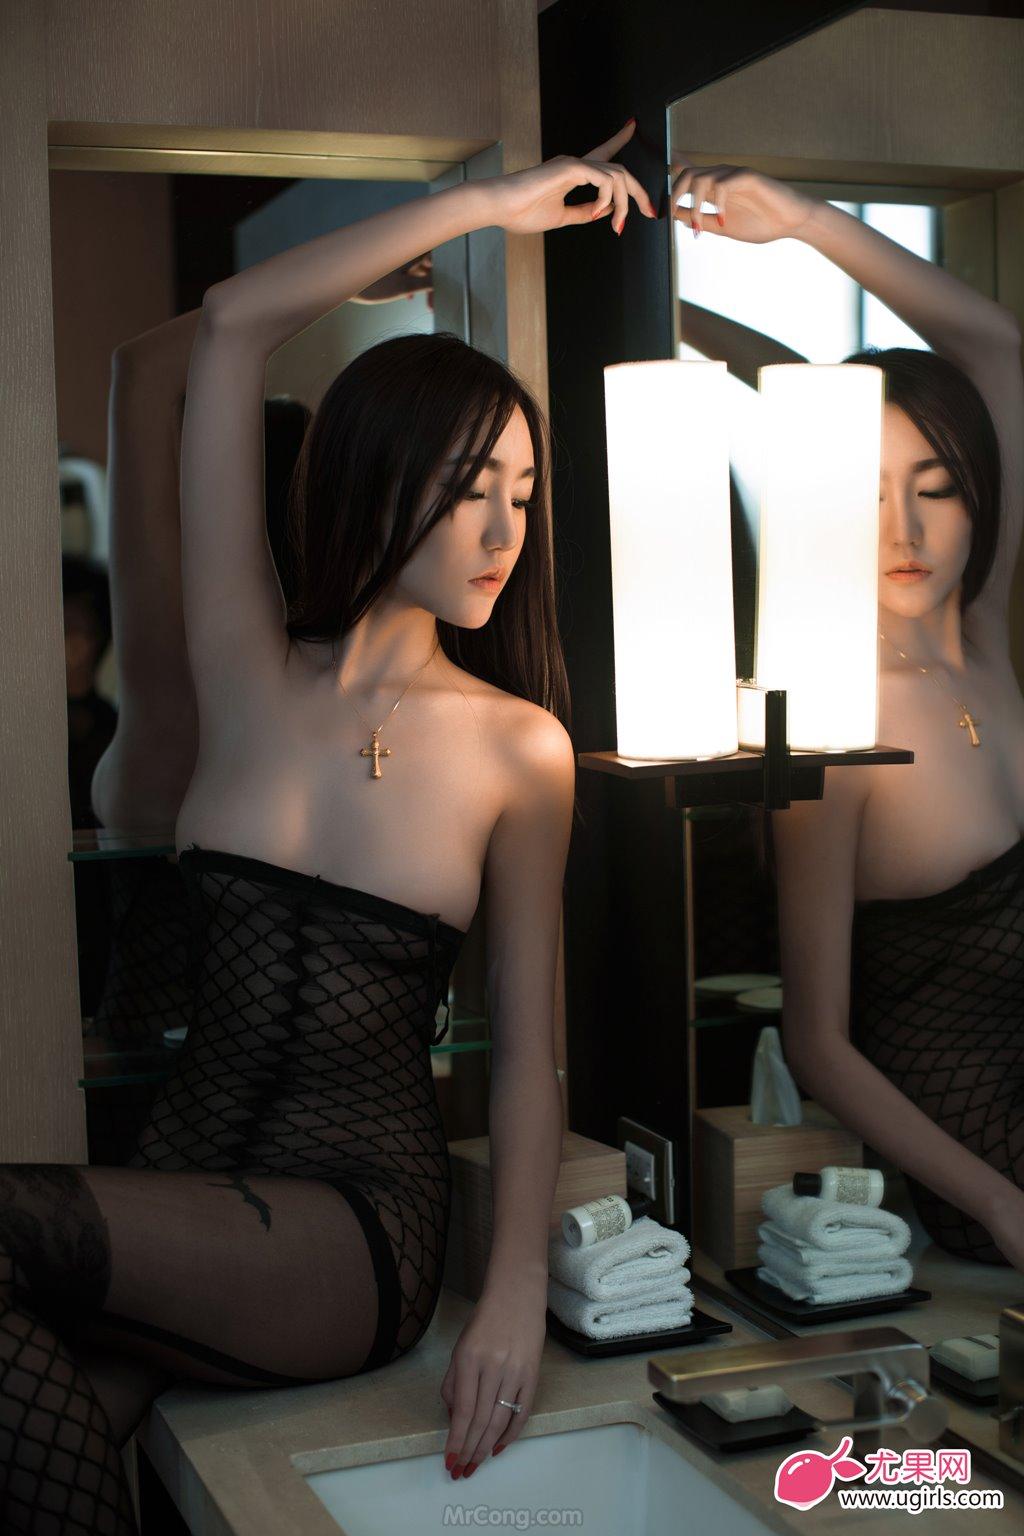 Image MrCong.com-UGIRLS-026-Guo-Wan-Qi-023 in post Người đẹp Guo Wan Qi (郭婉祈) gợi cảm trong bộ ảnh UGIRLS 026